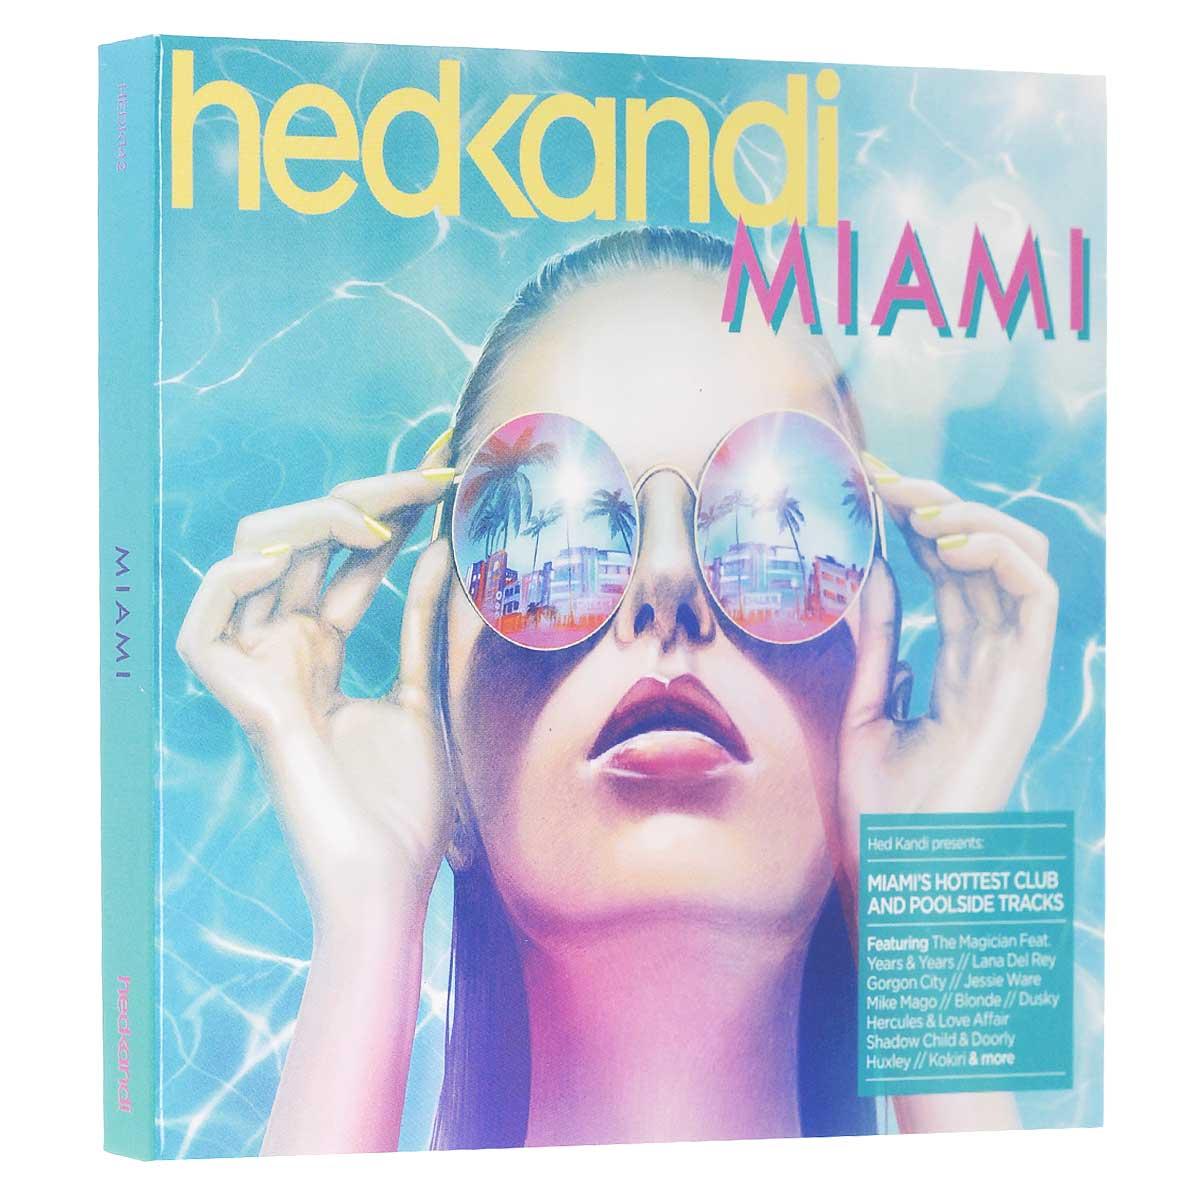 Hed Kandi. Miami 2015 (2 CD) 2 Audio CD